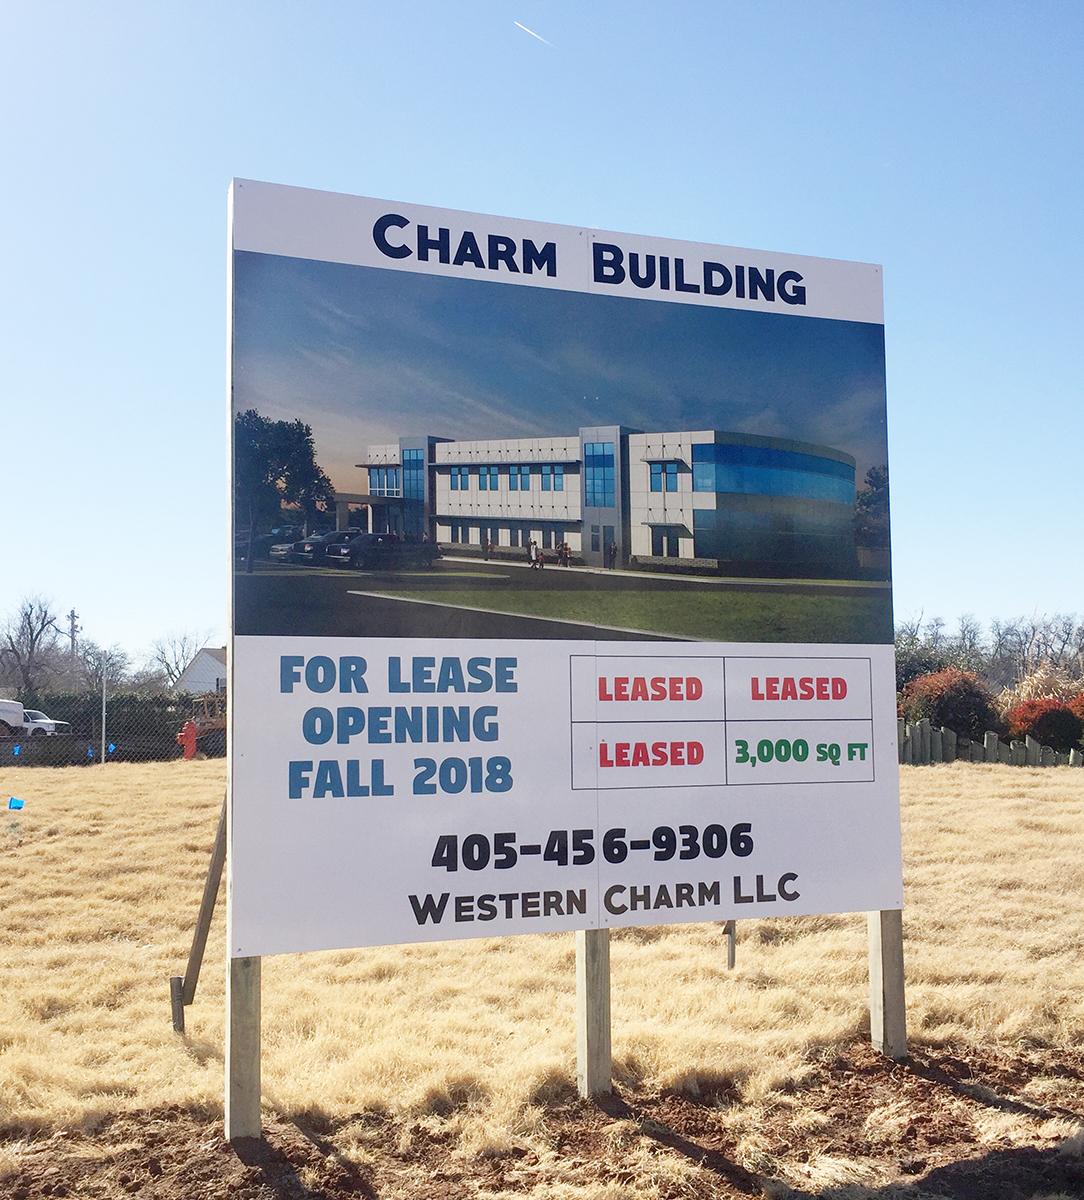 exterior - Charm building